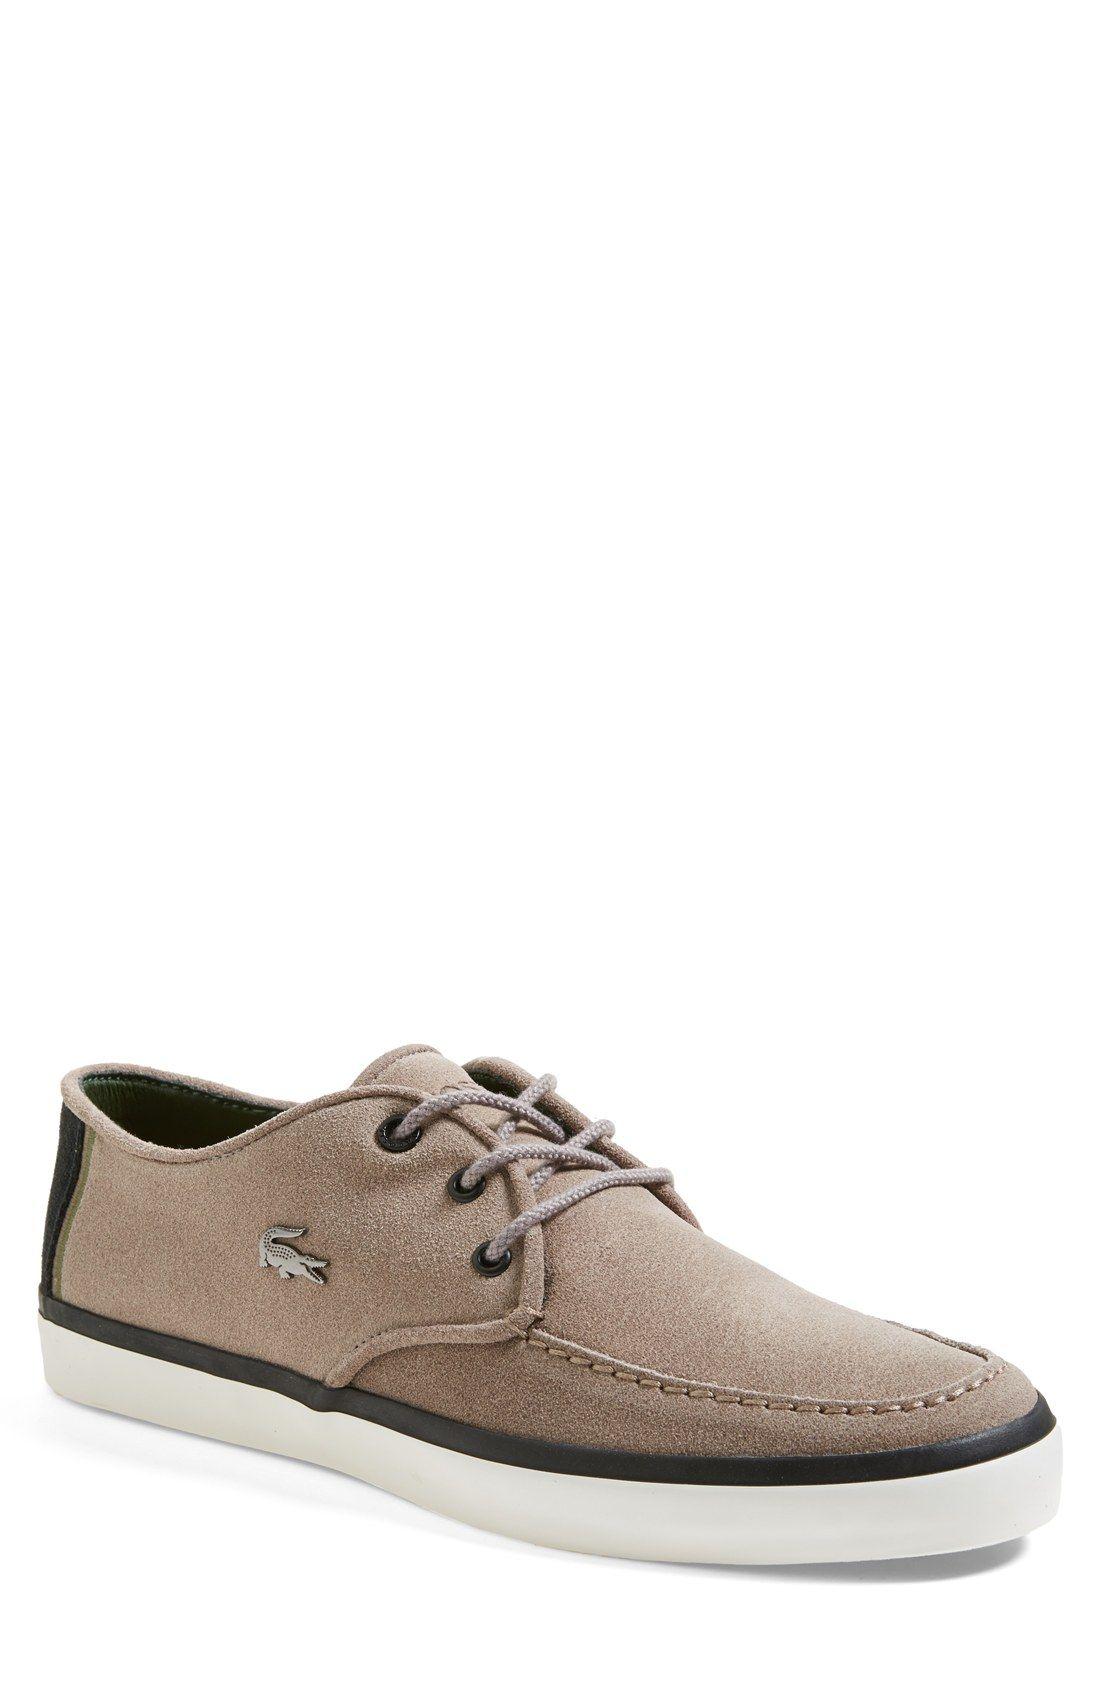 dffd97b3ec9 Lacoste boat shoes. Chaussures Lacoste